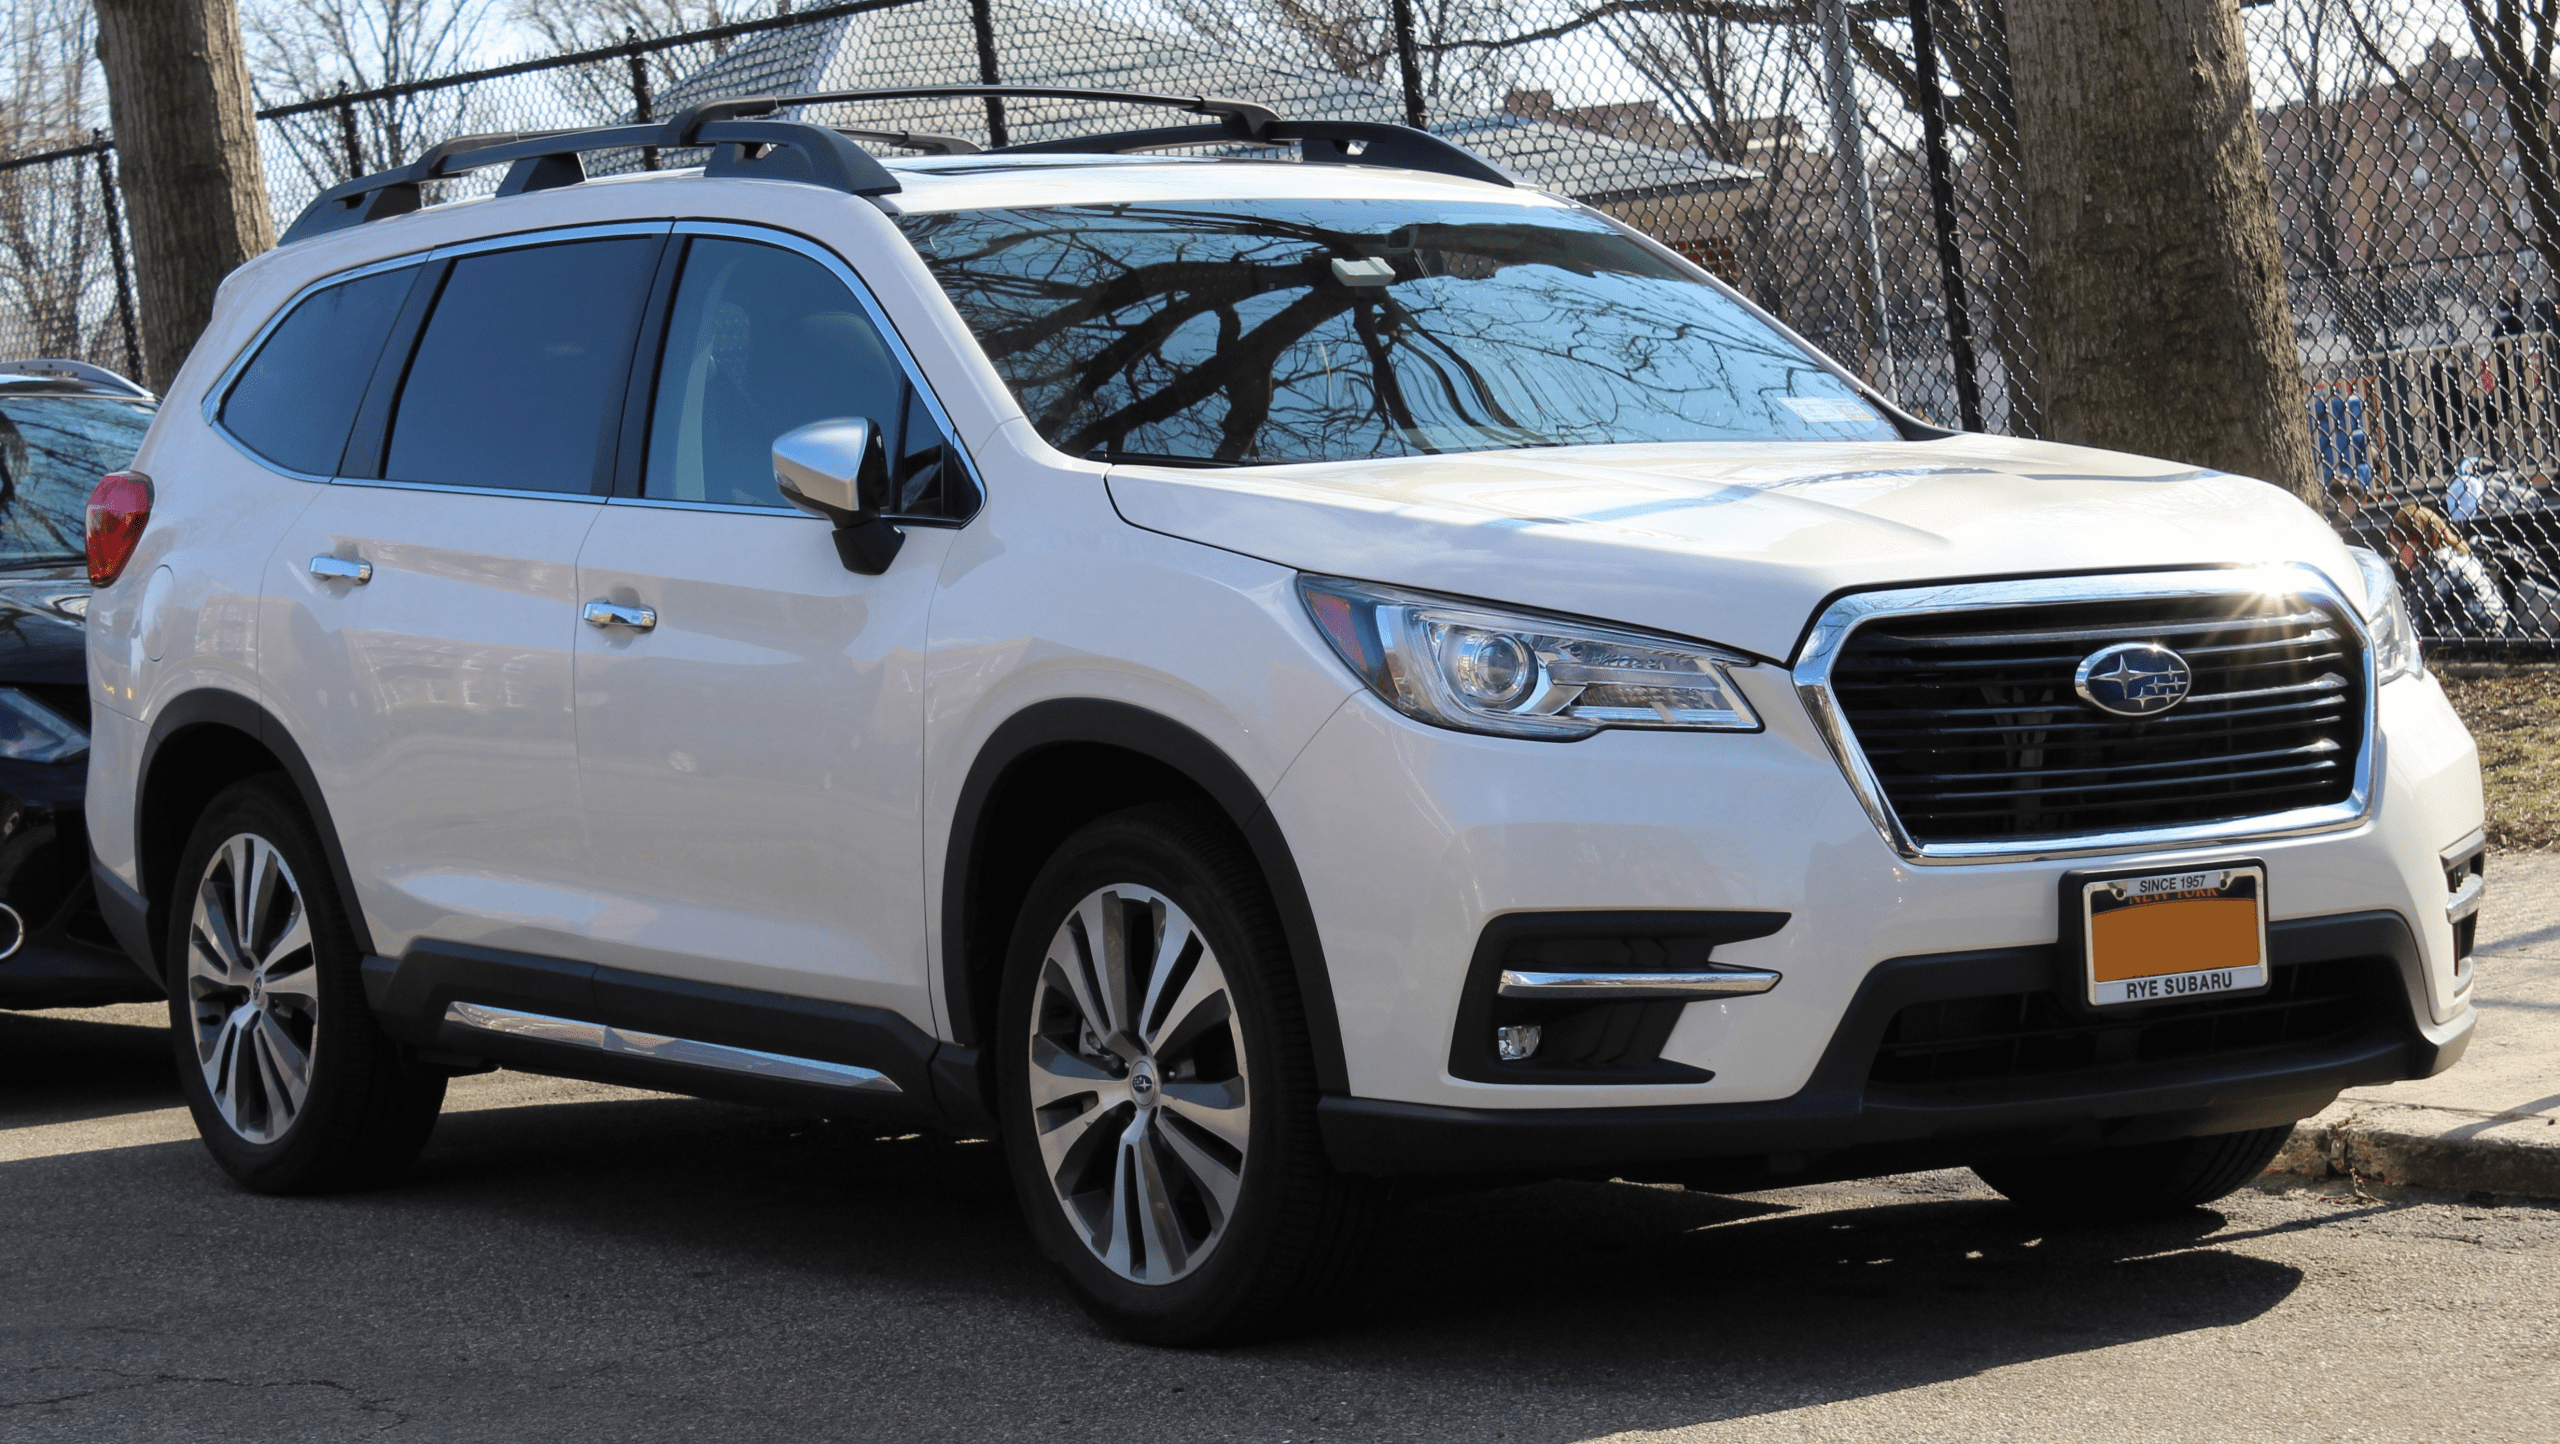 2021 Subaru forester Performance in 2020 Subaru forester